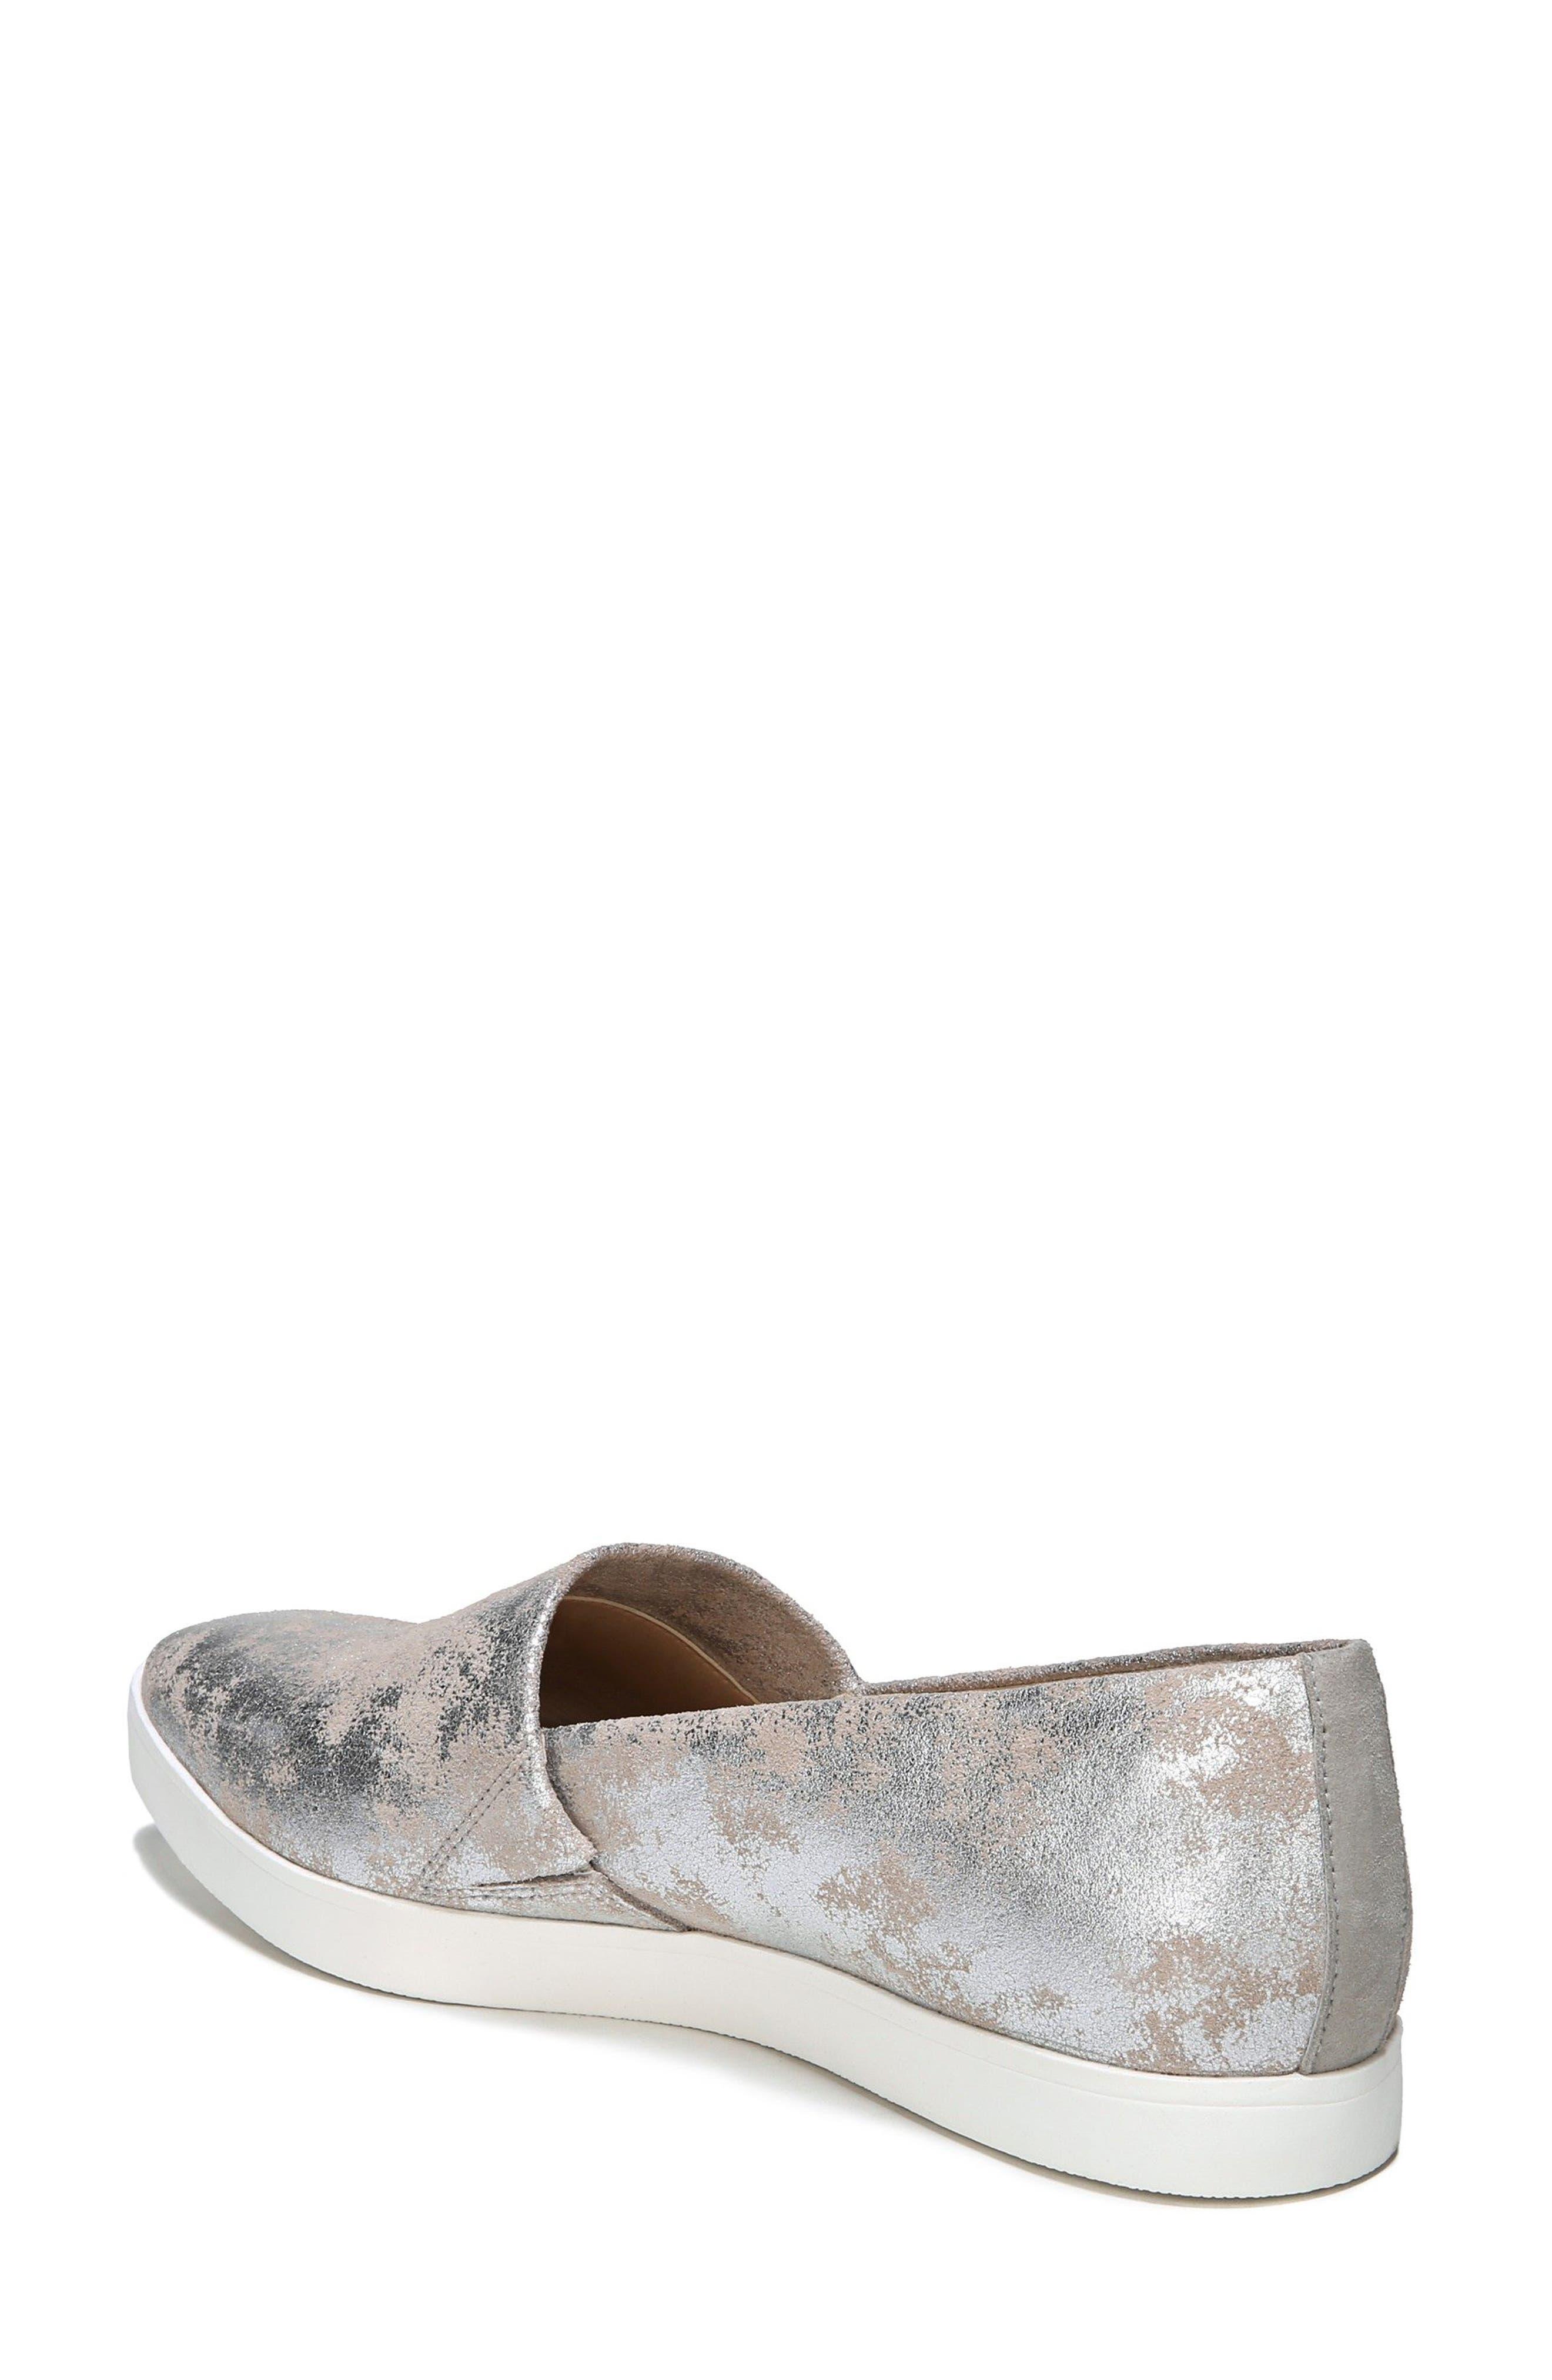 'Vienna' Slip-on Sneaker,                             Alternate thumbnail 2, color,                             040